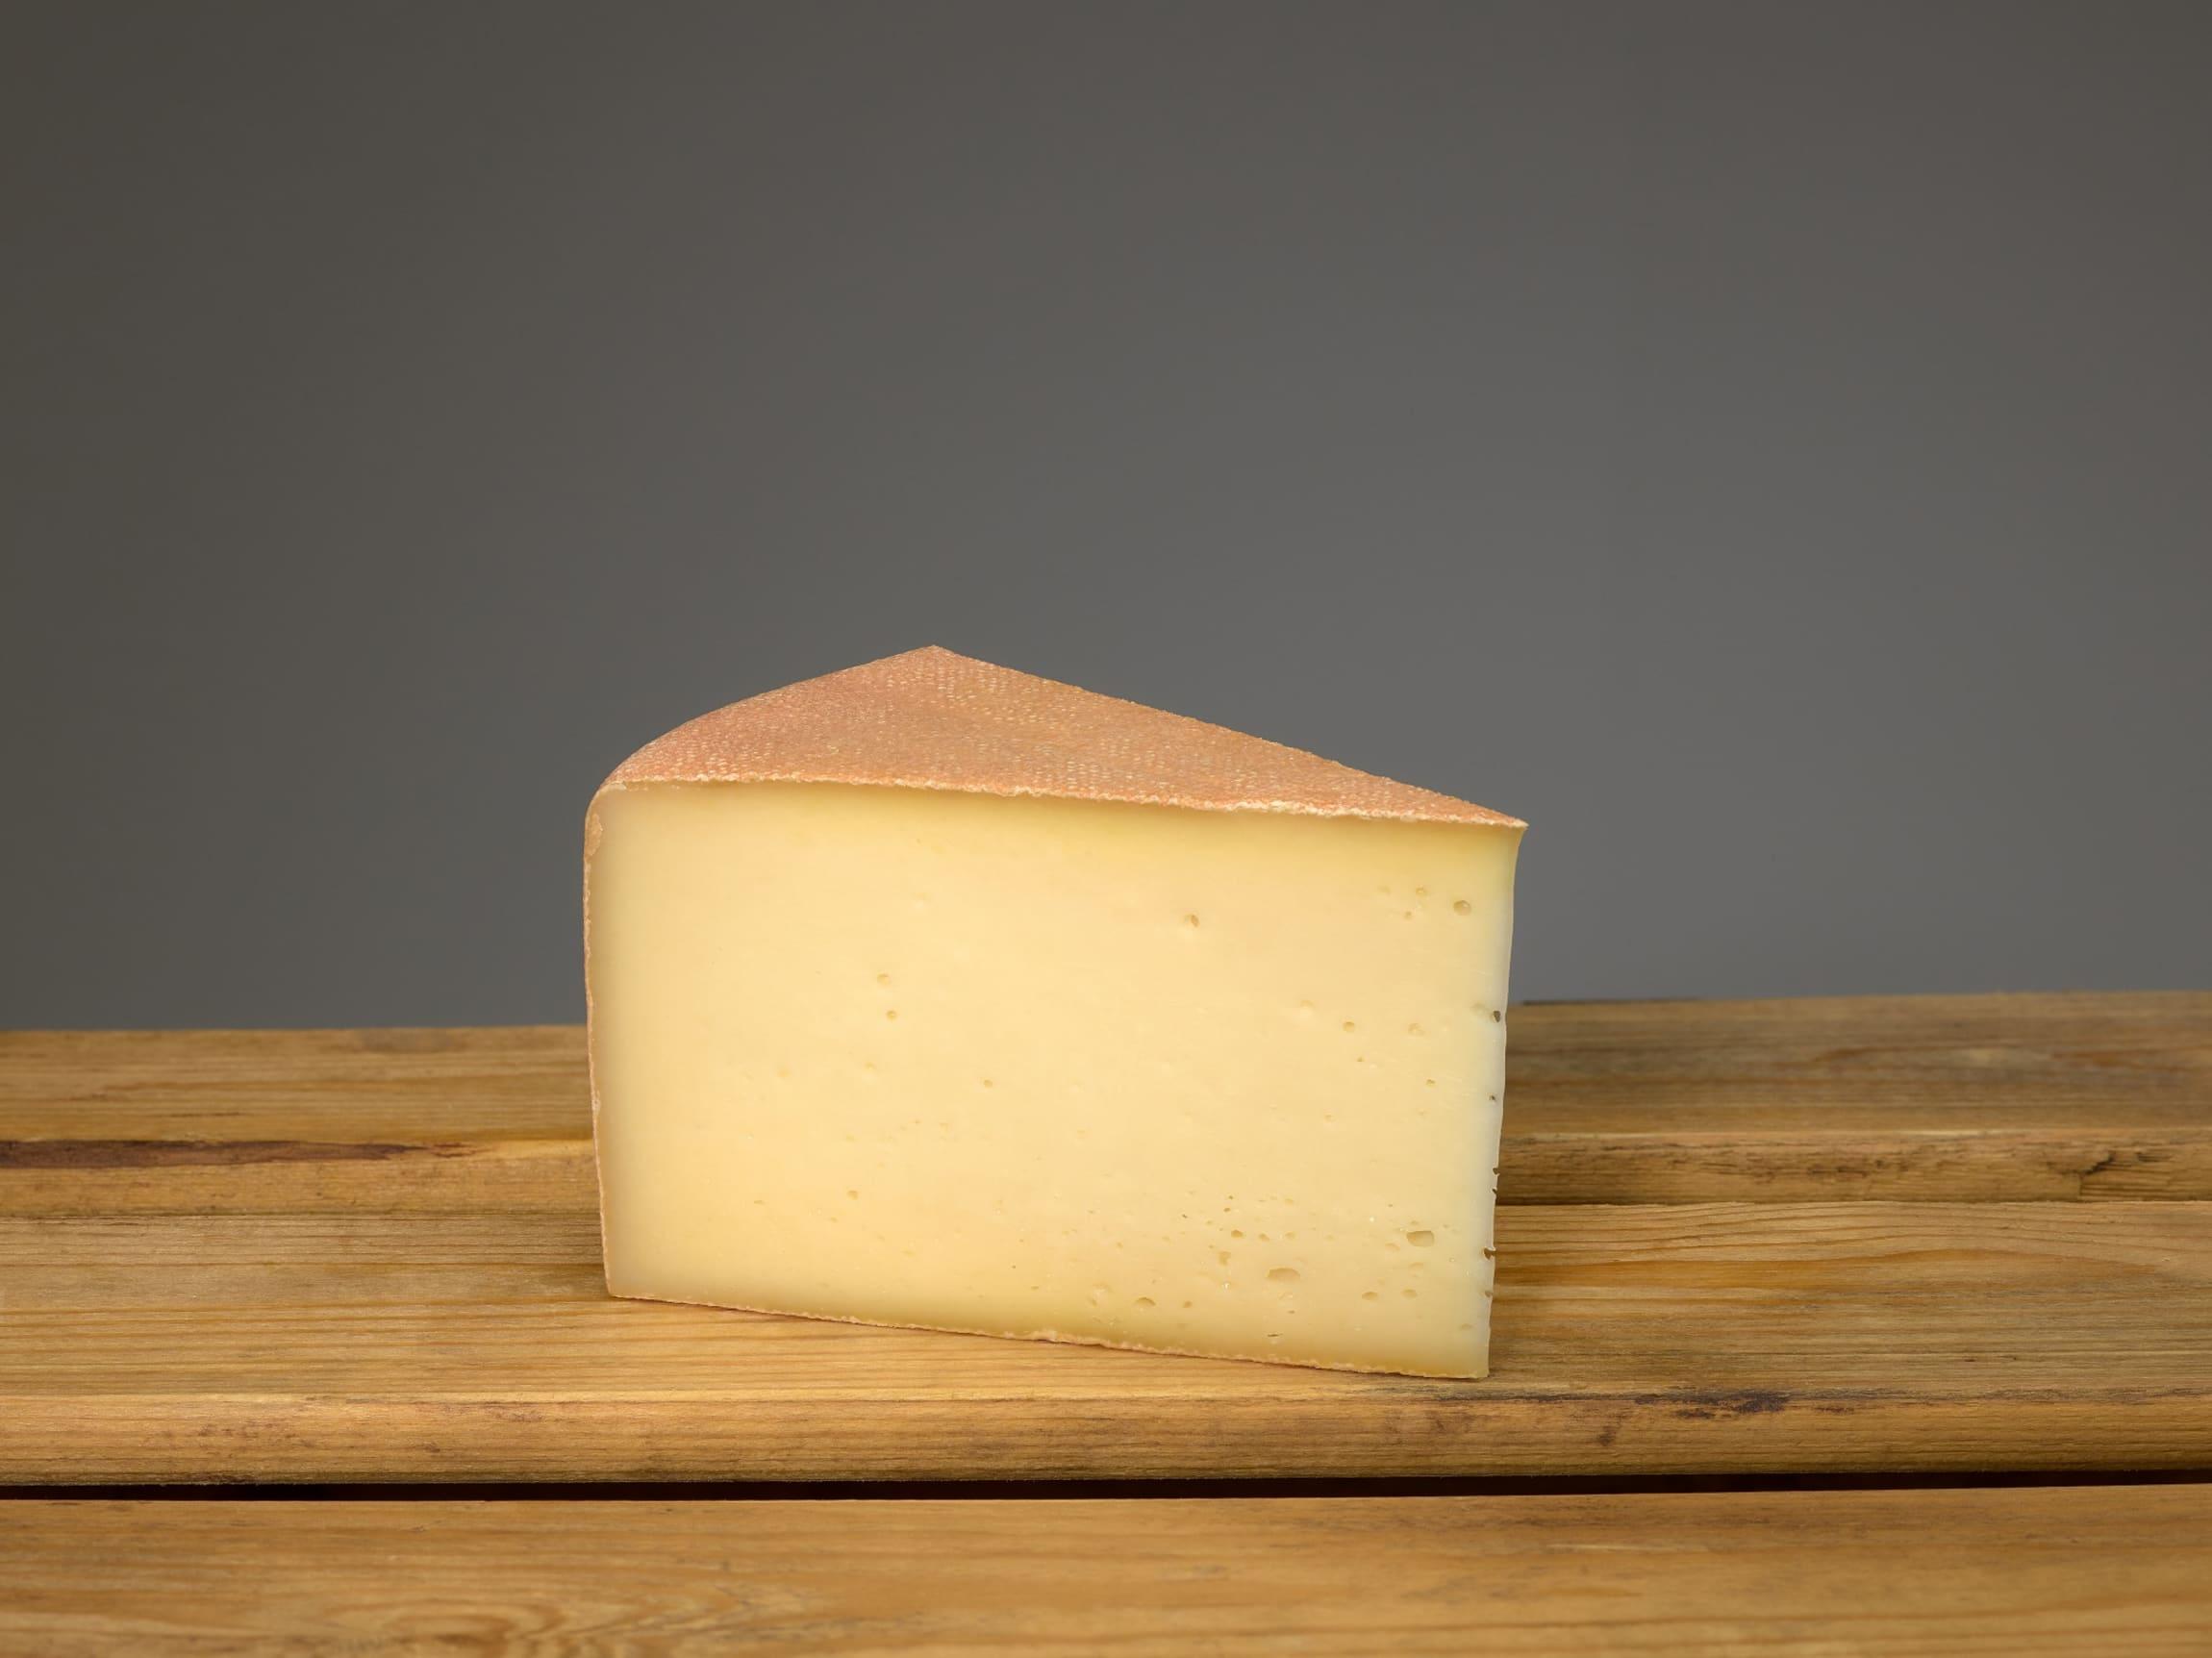 Rød Geit er en halvfast rødkittost ysta på rein geitemjølk